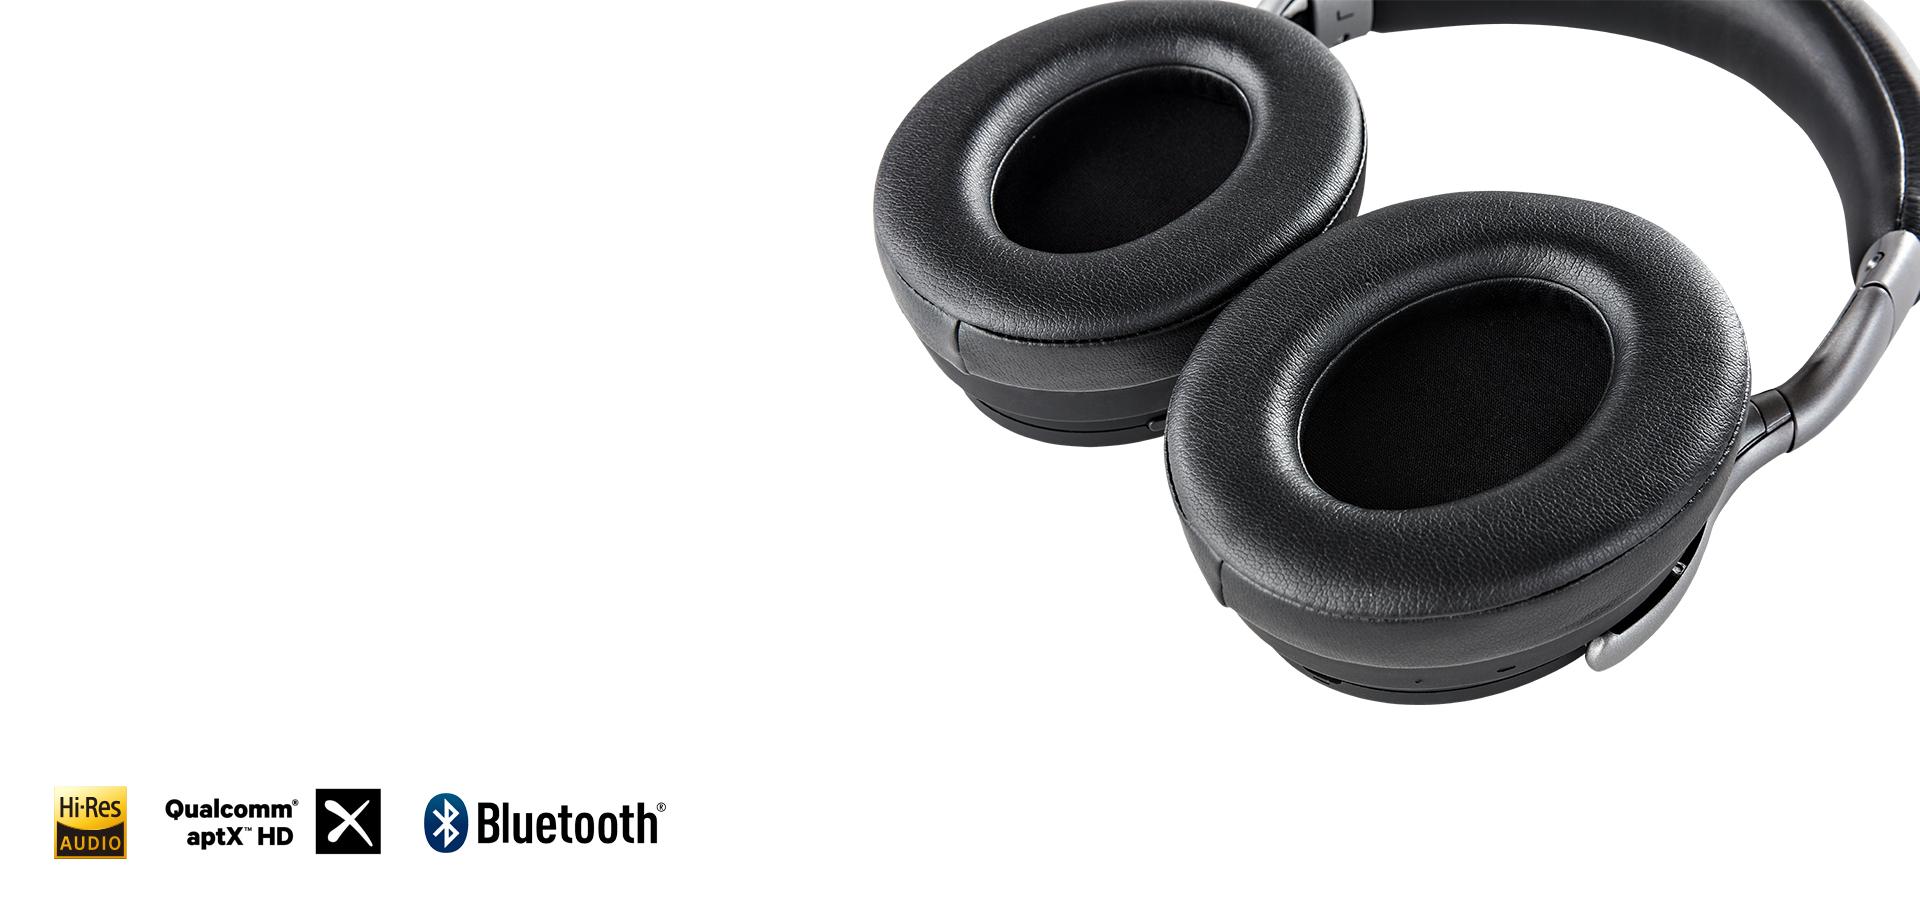 Denon AH-GC30 | Anh Duy Audio